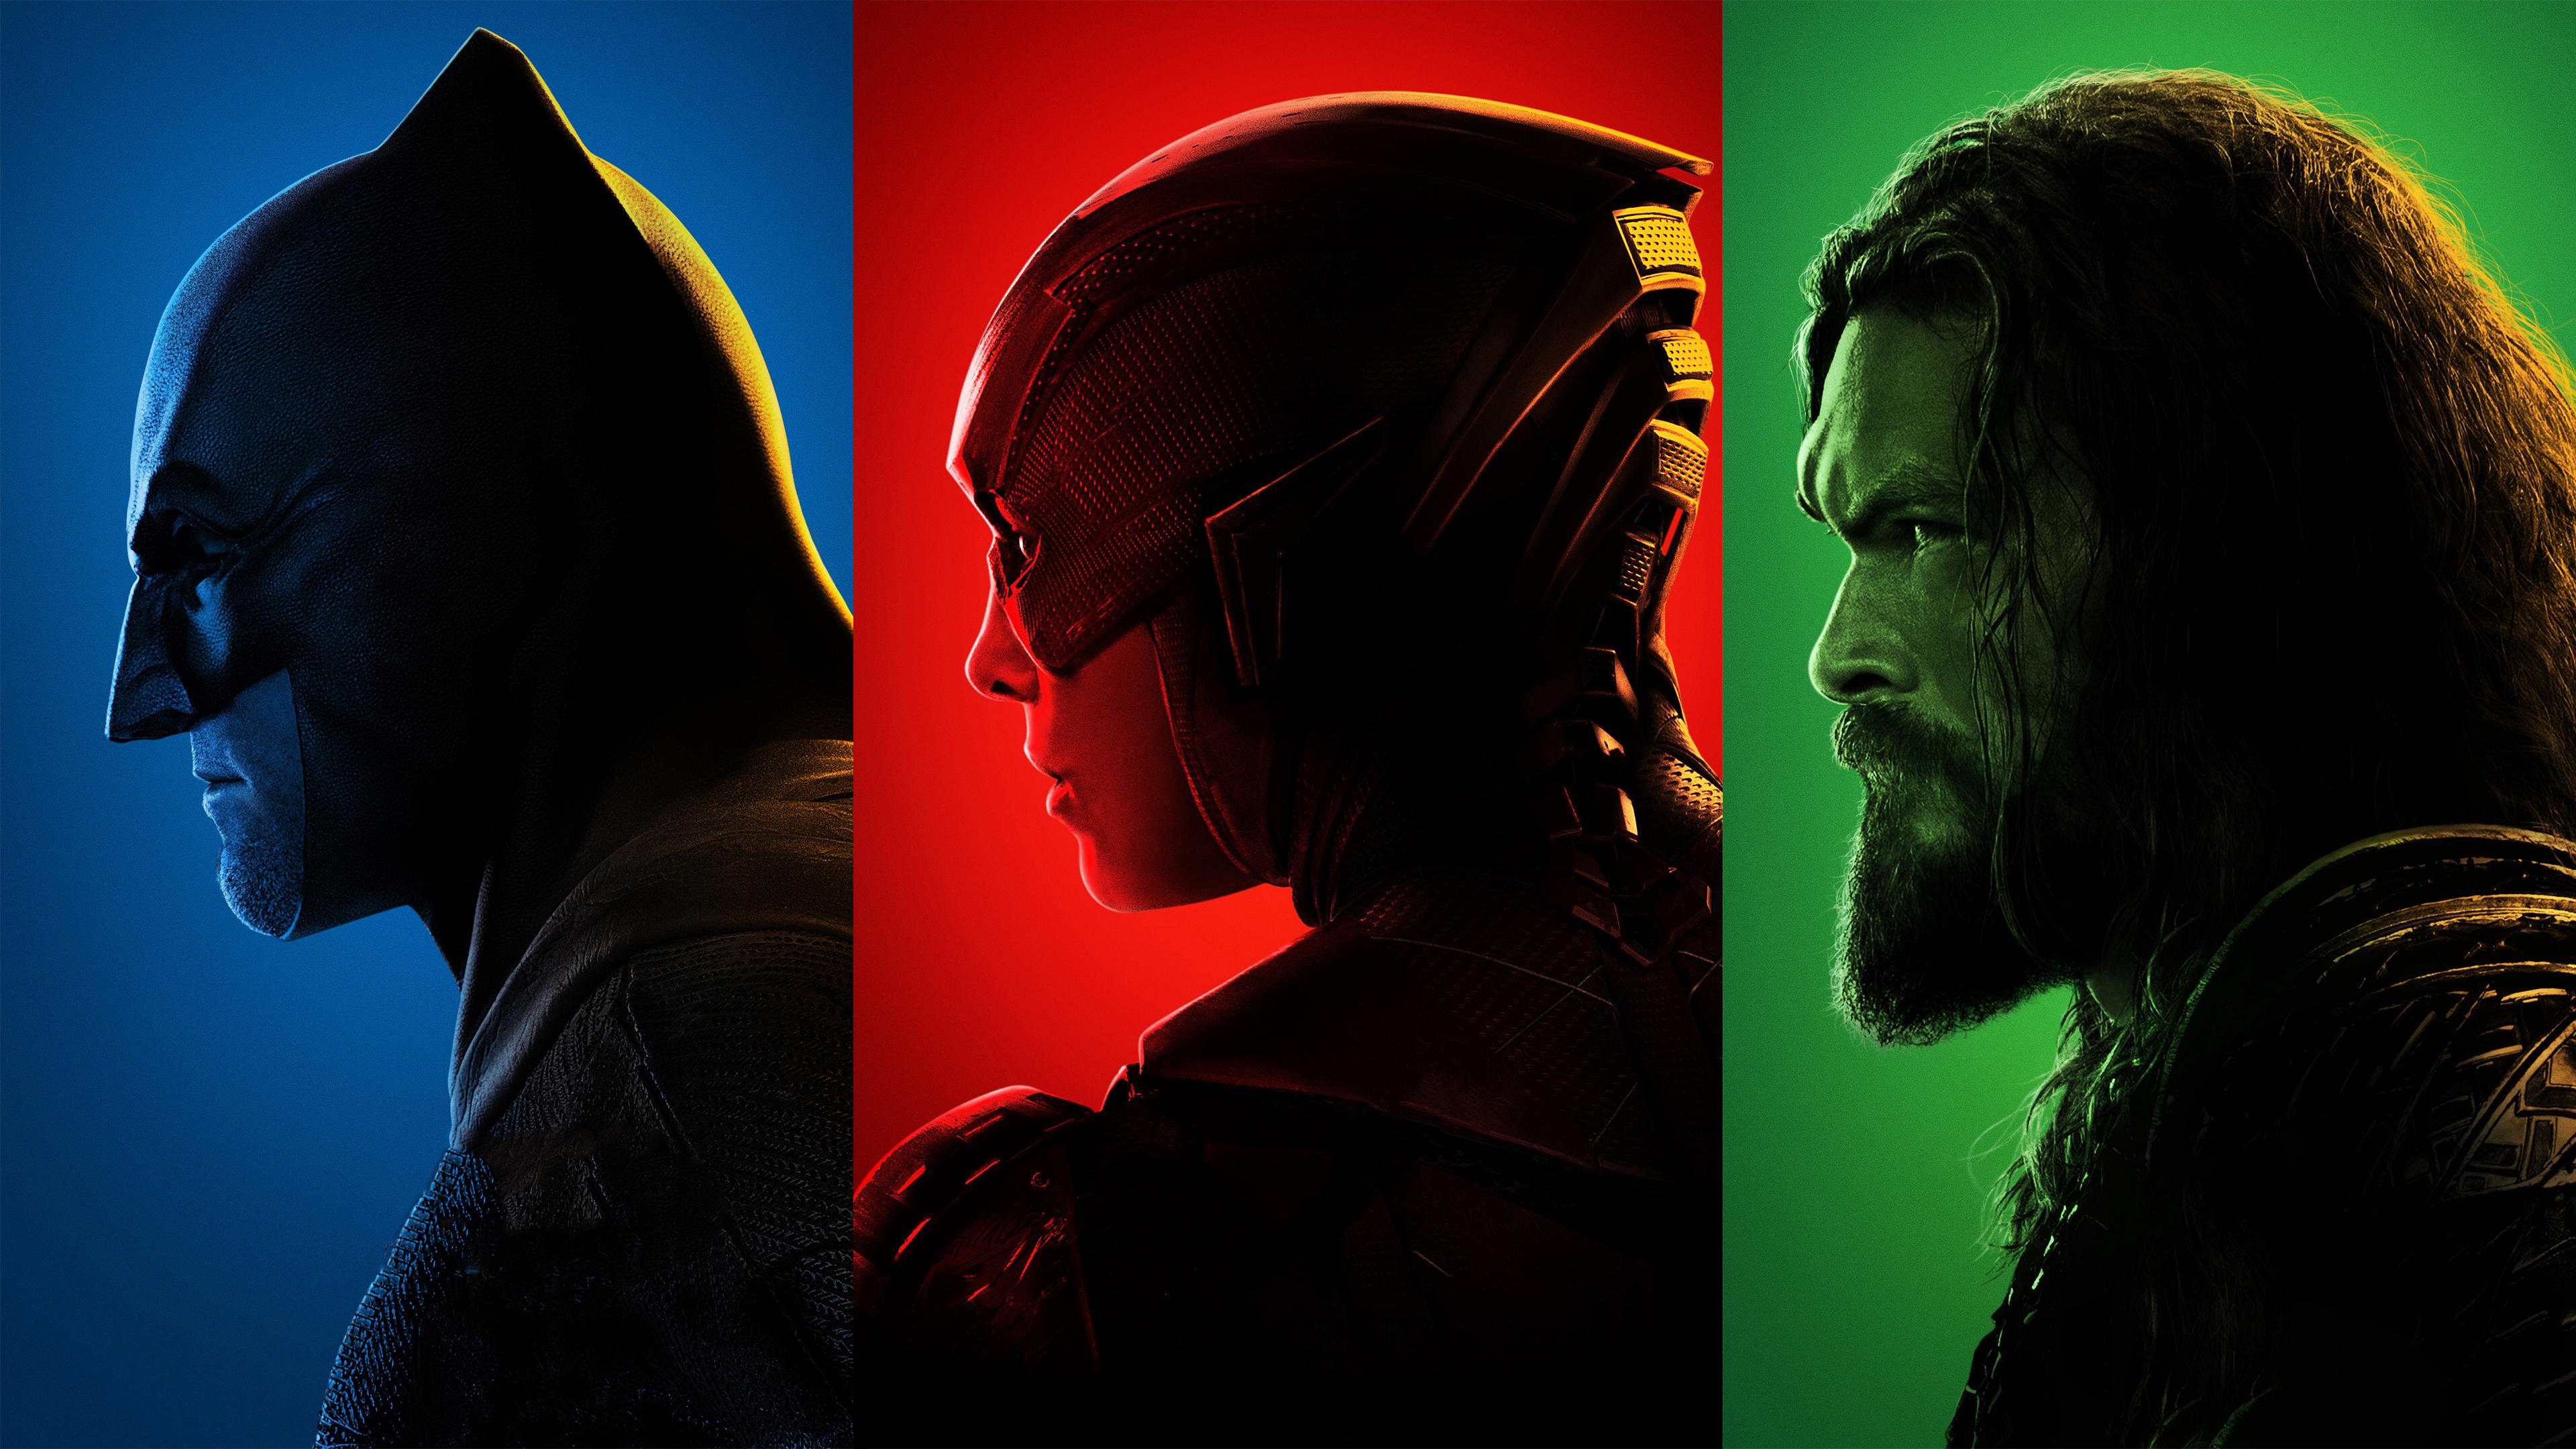 Justice League 2017 Movie 4k Hd Desktop Wallpaper For 4k: 1366x768 Batman Flash Aquaman Justice League 4k 1366x768